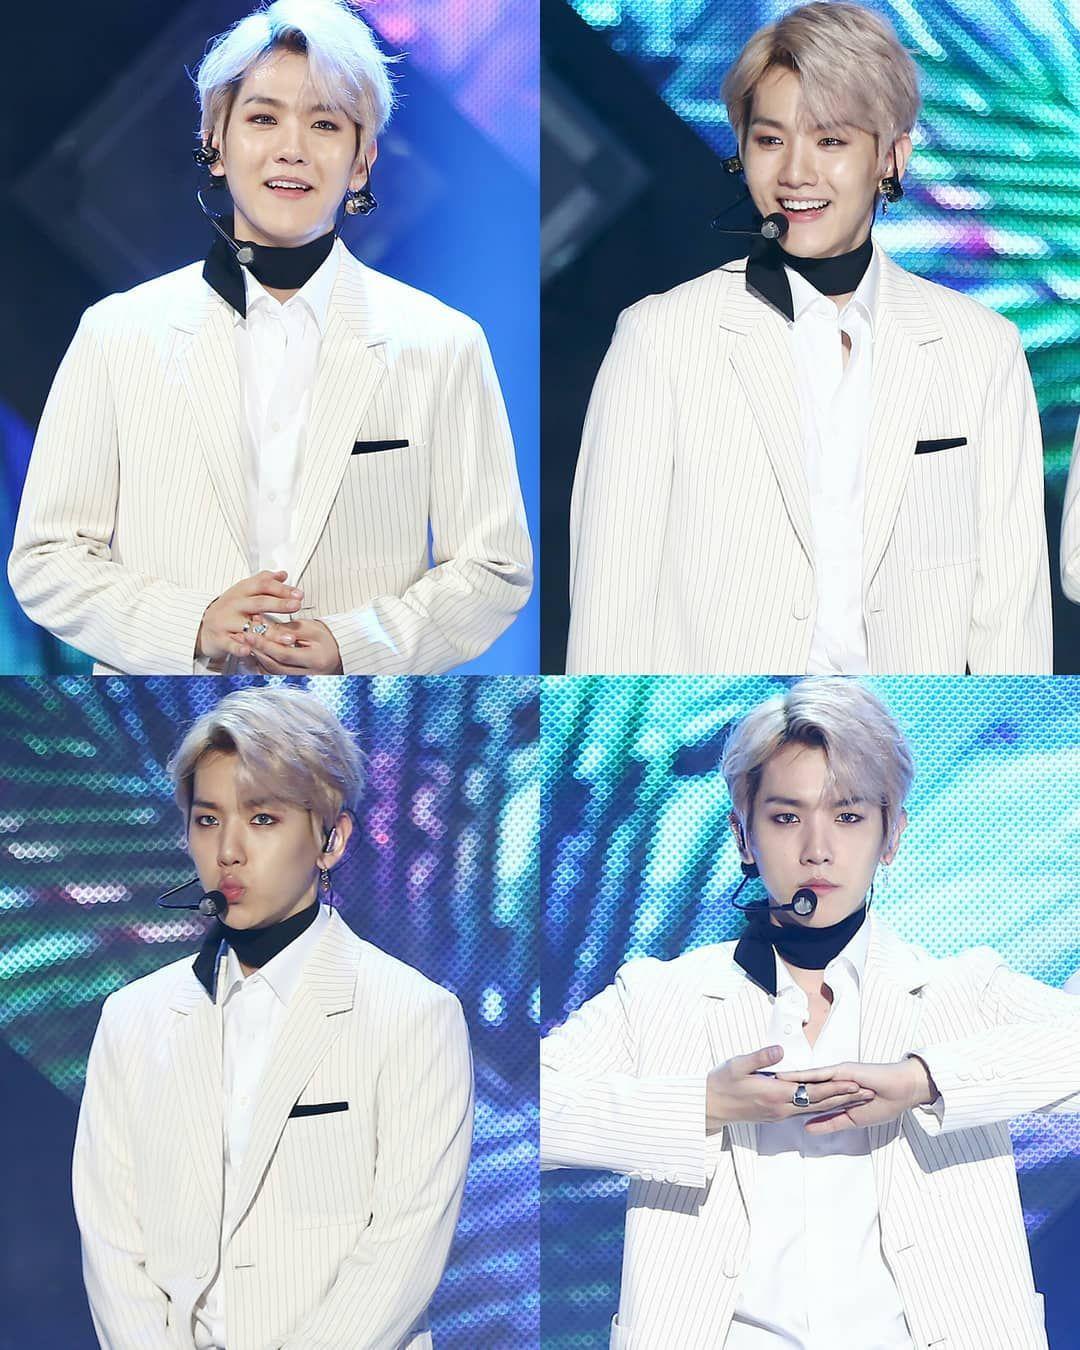 Top 10 Most Handsome KPop Male Idols (2020) Look